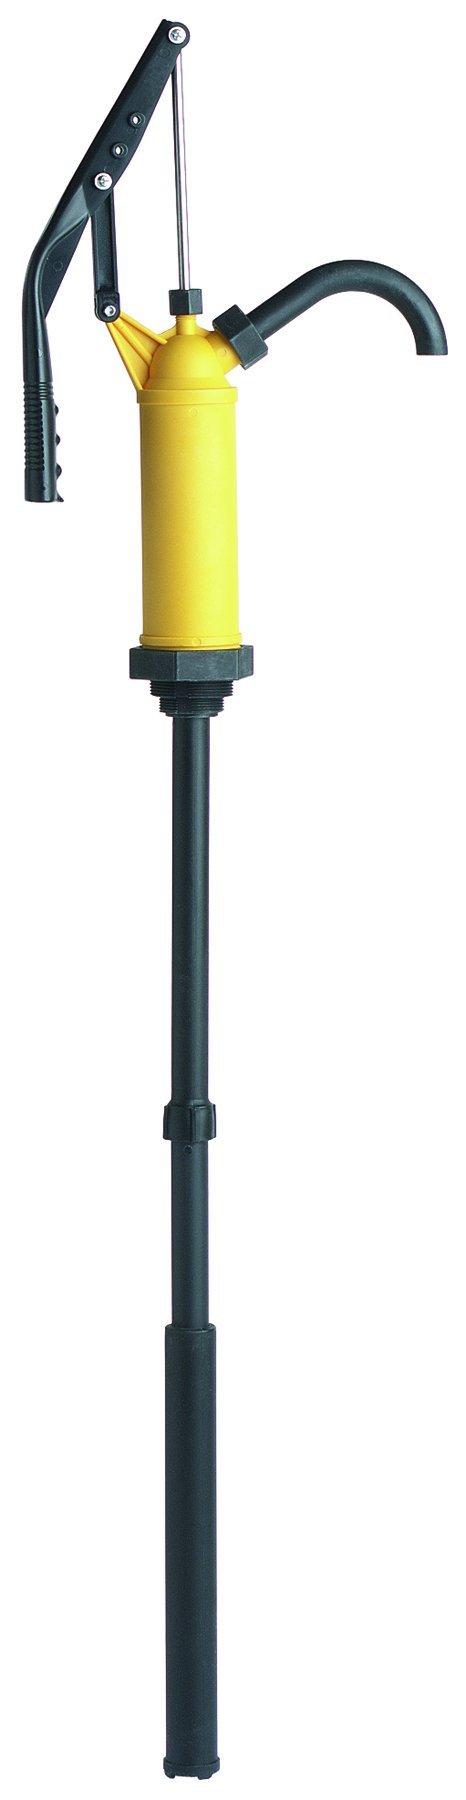 Plews 55-161 Plastic Standard Duty Lever Pump by Plews & Edelmann